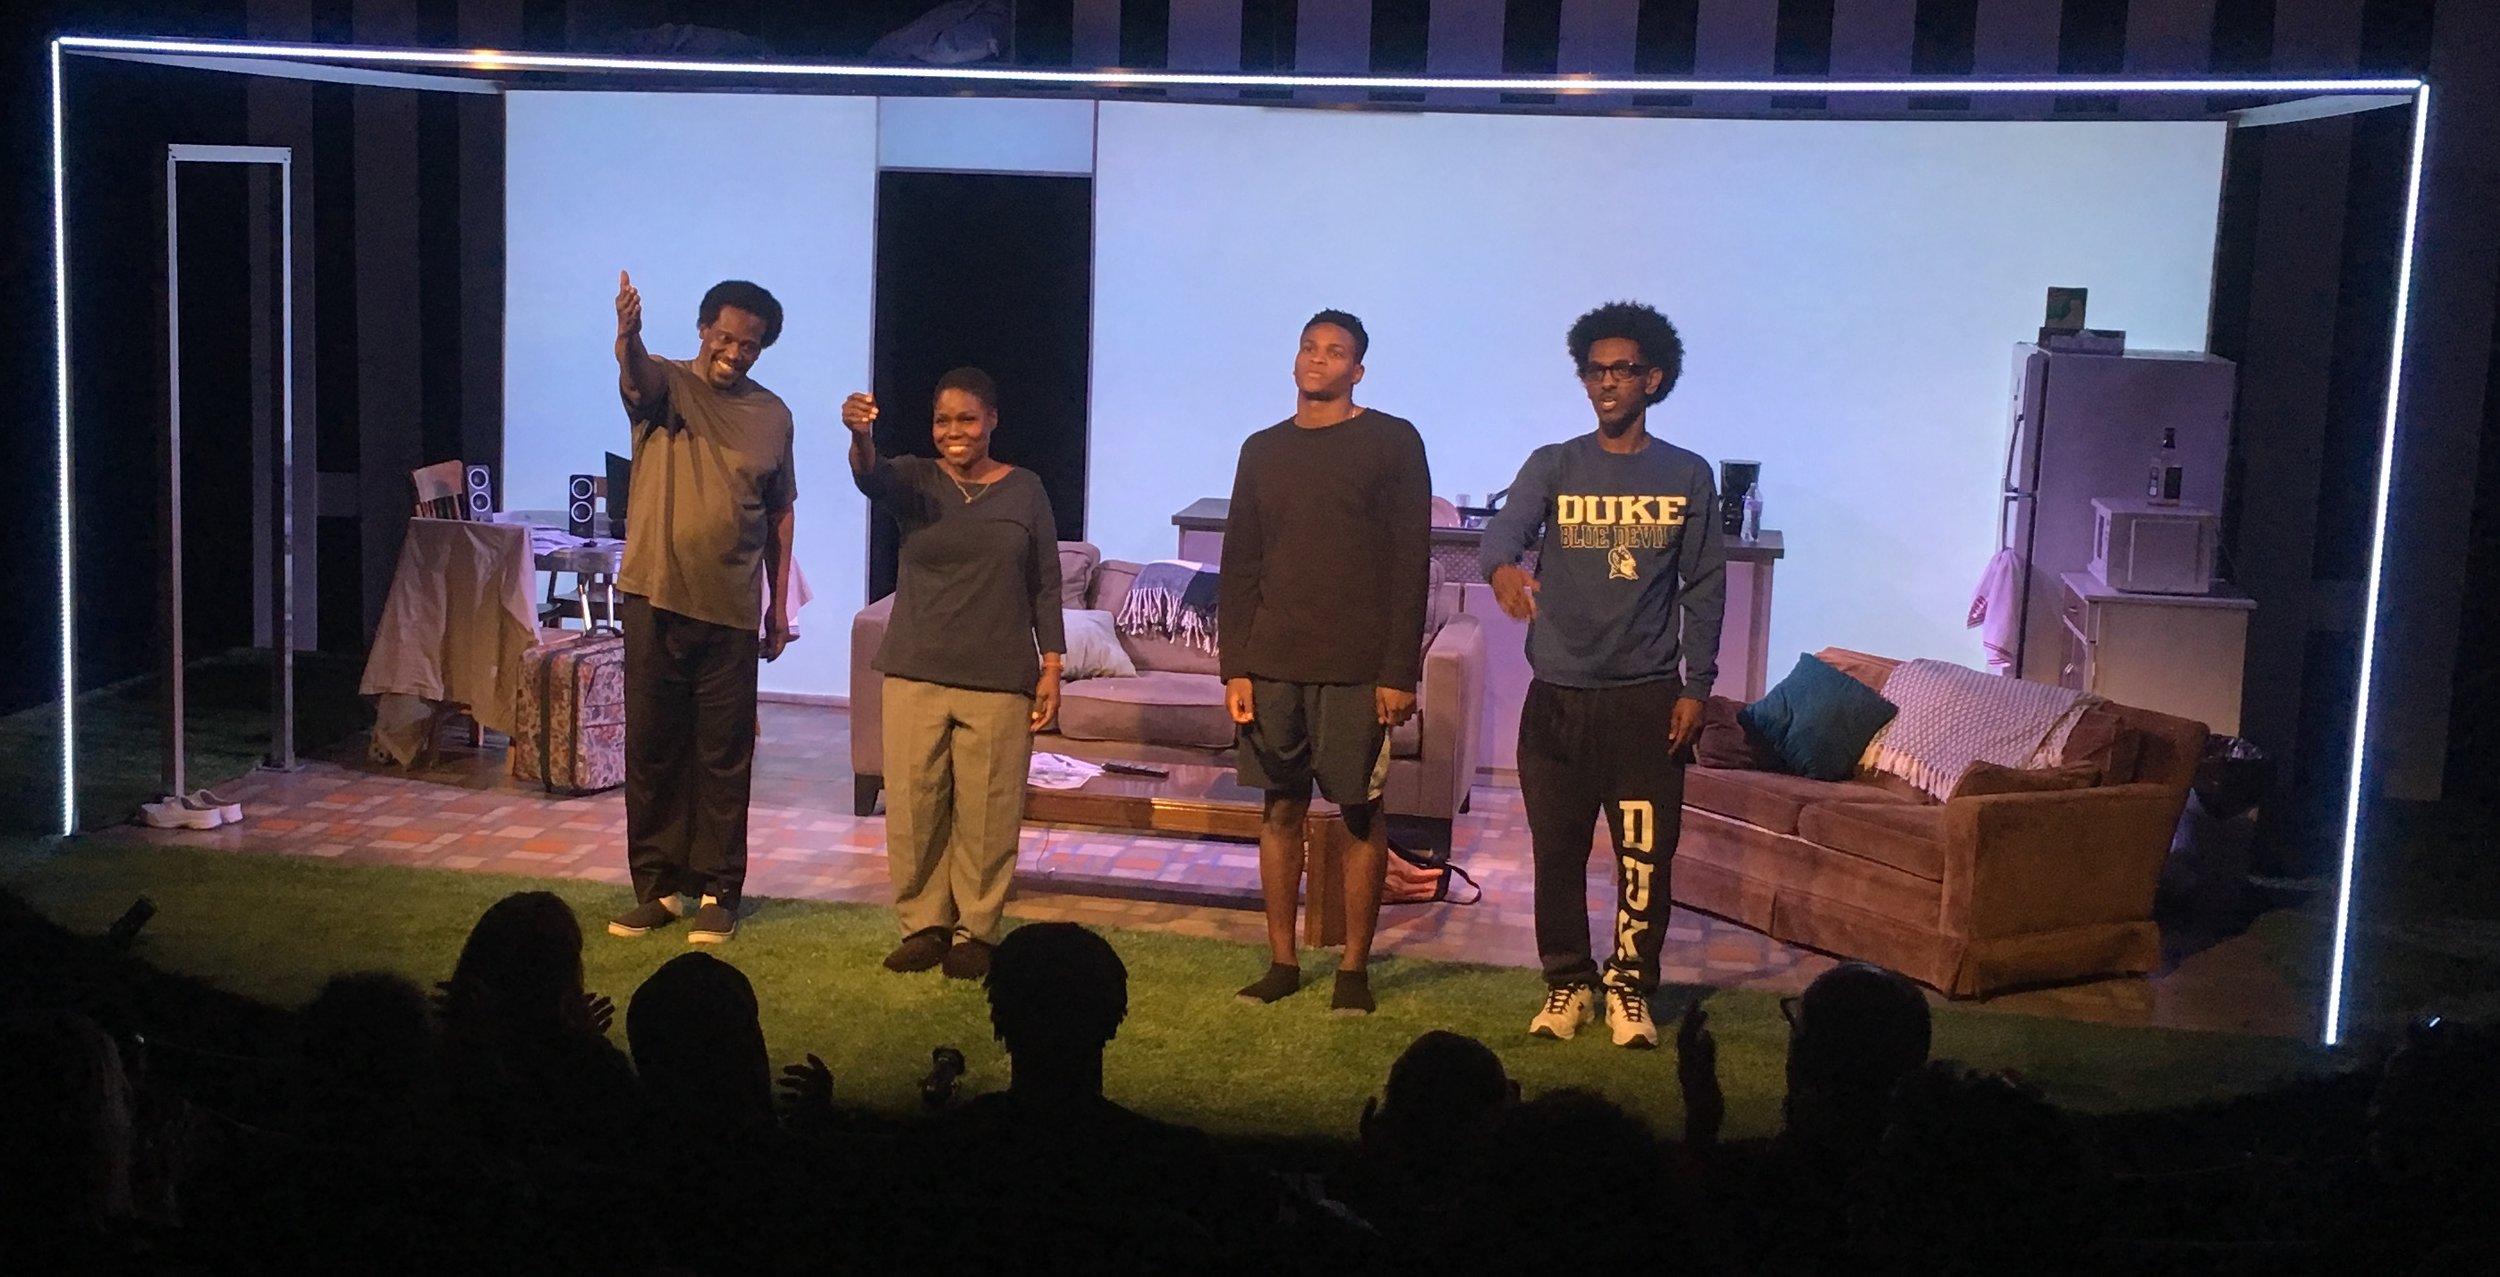 L2R Cast Call: Joseph Primes (Girma Kifle), Gabrielle Lott-Rogers (Elizabeth Kifle), Freedom Martin (Daniel Kifle), Simon Gebremedhin (Johnathan Kifle)